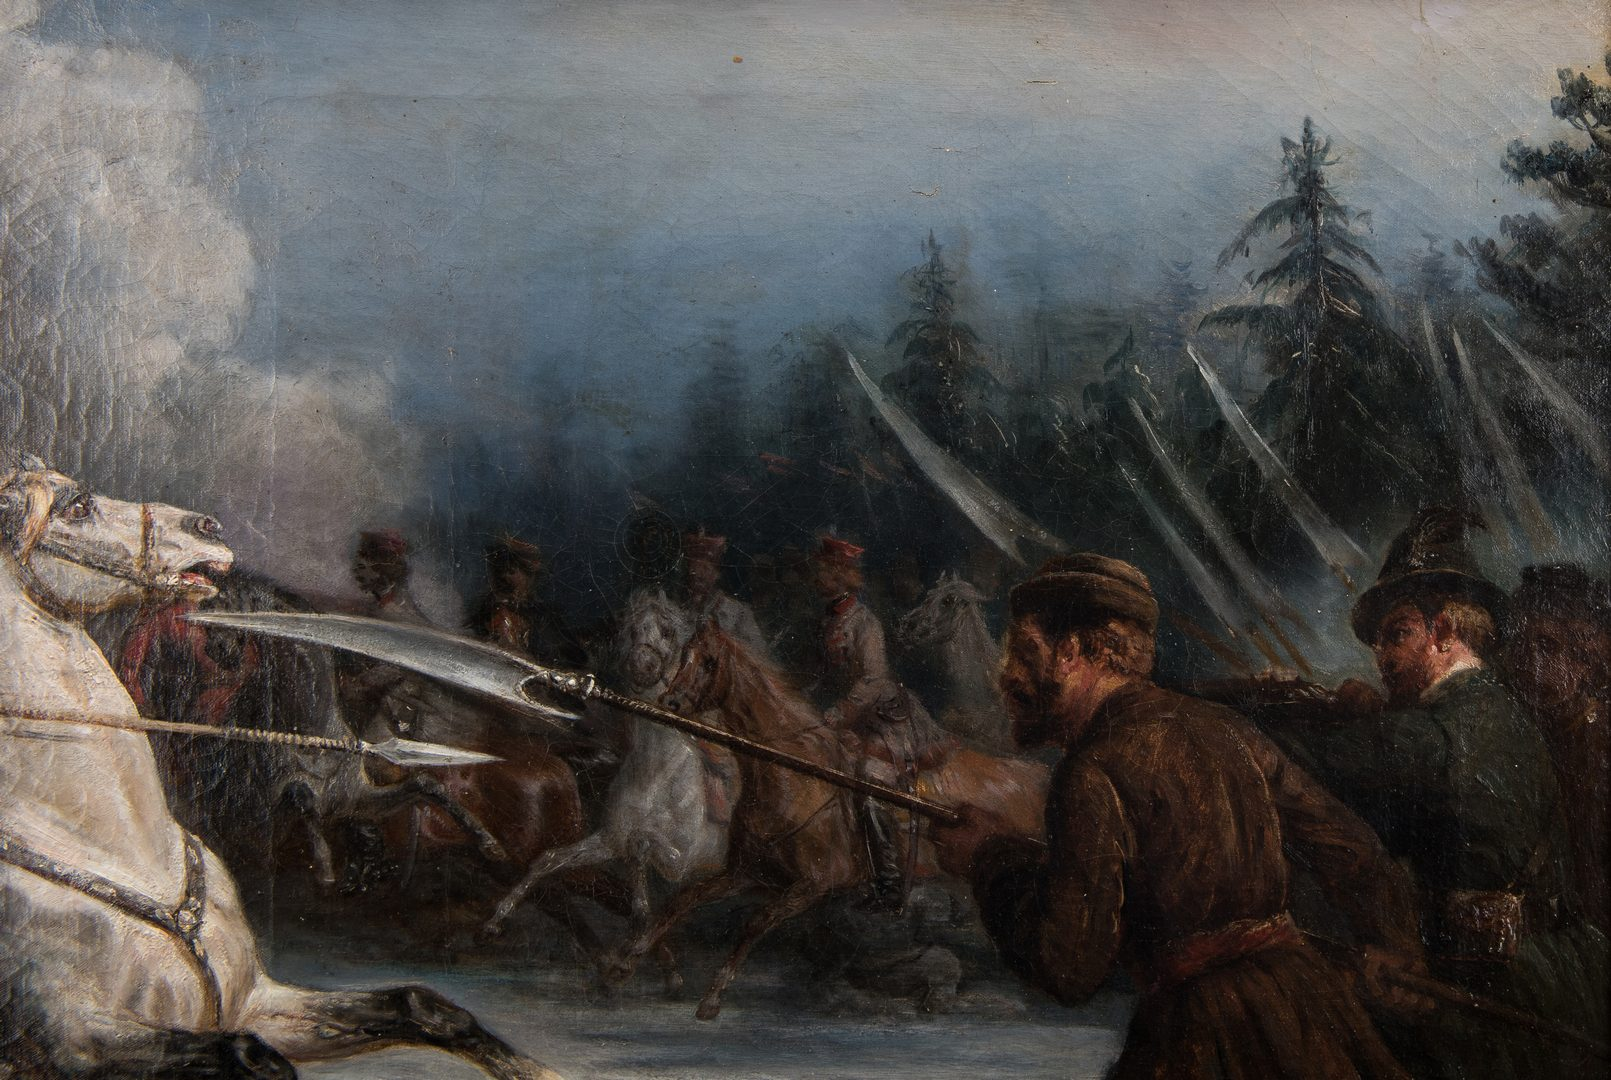 Lot 334: Manner of Janvier Suchodolski – November Uprising